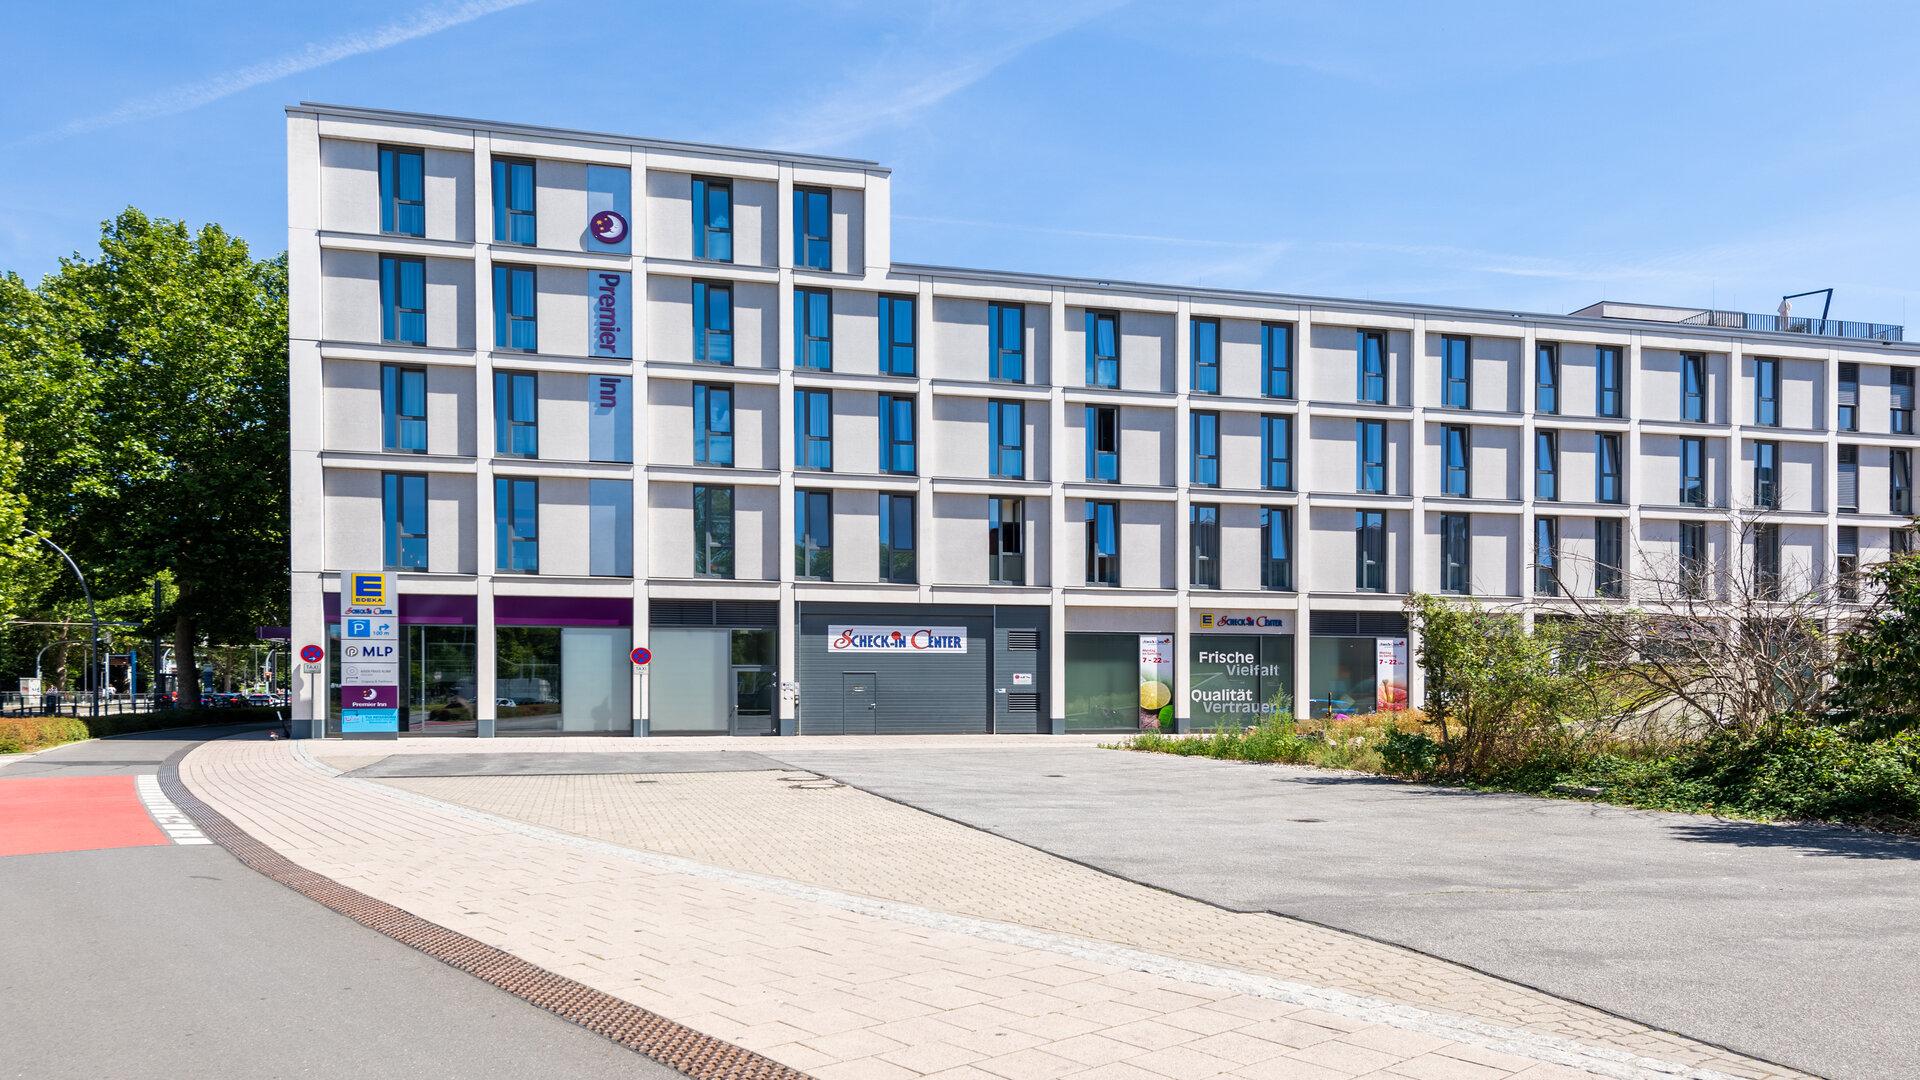 Premier Inn Heidelberg City (Zentrum) Hotel